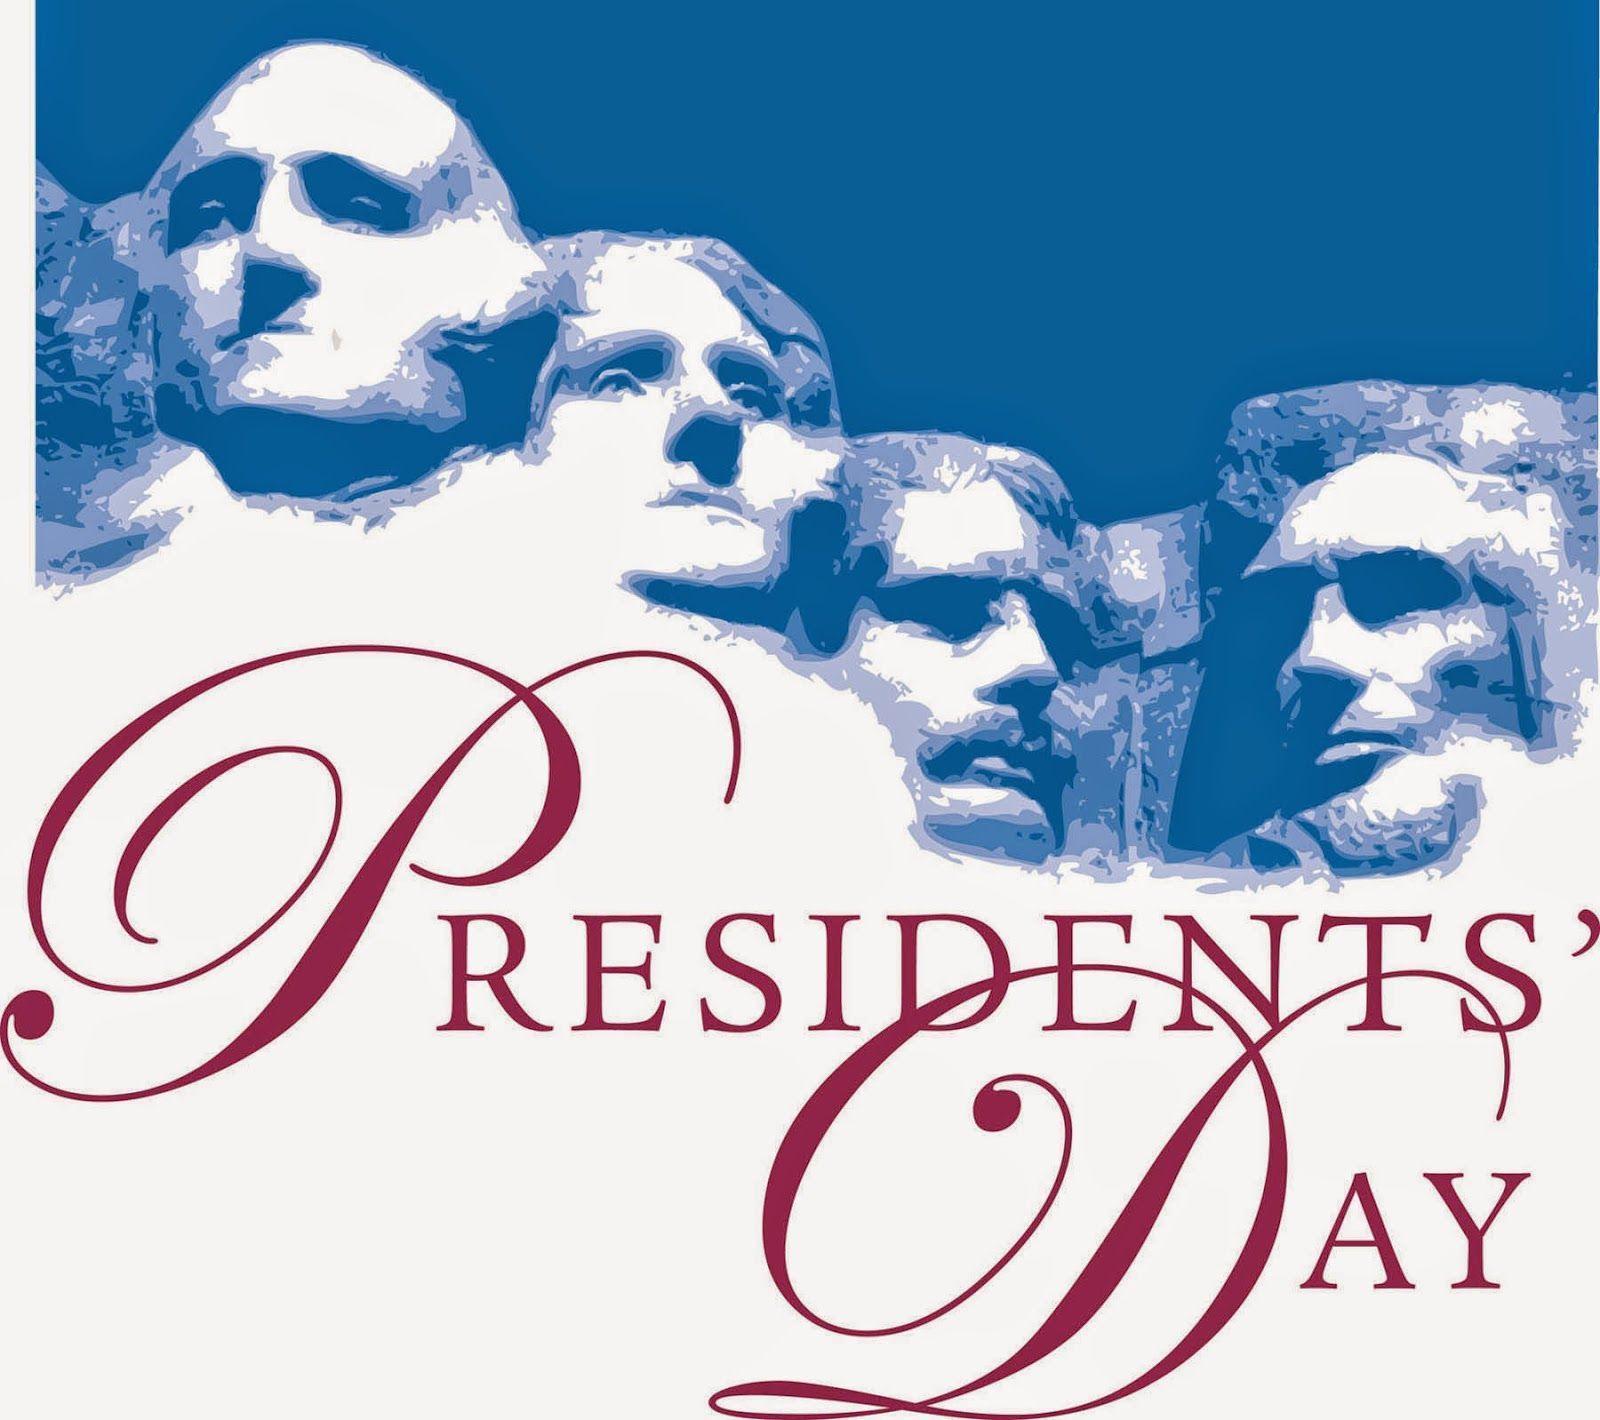 President's Day Wallpaper for Computer - WallpaperSafari